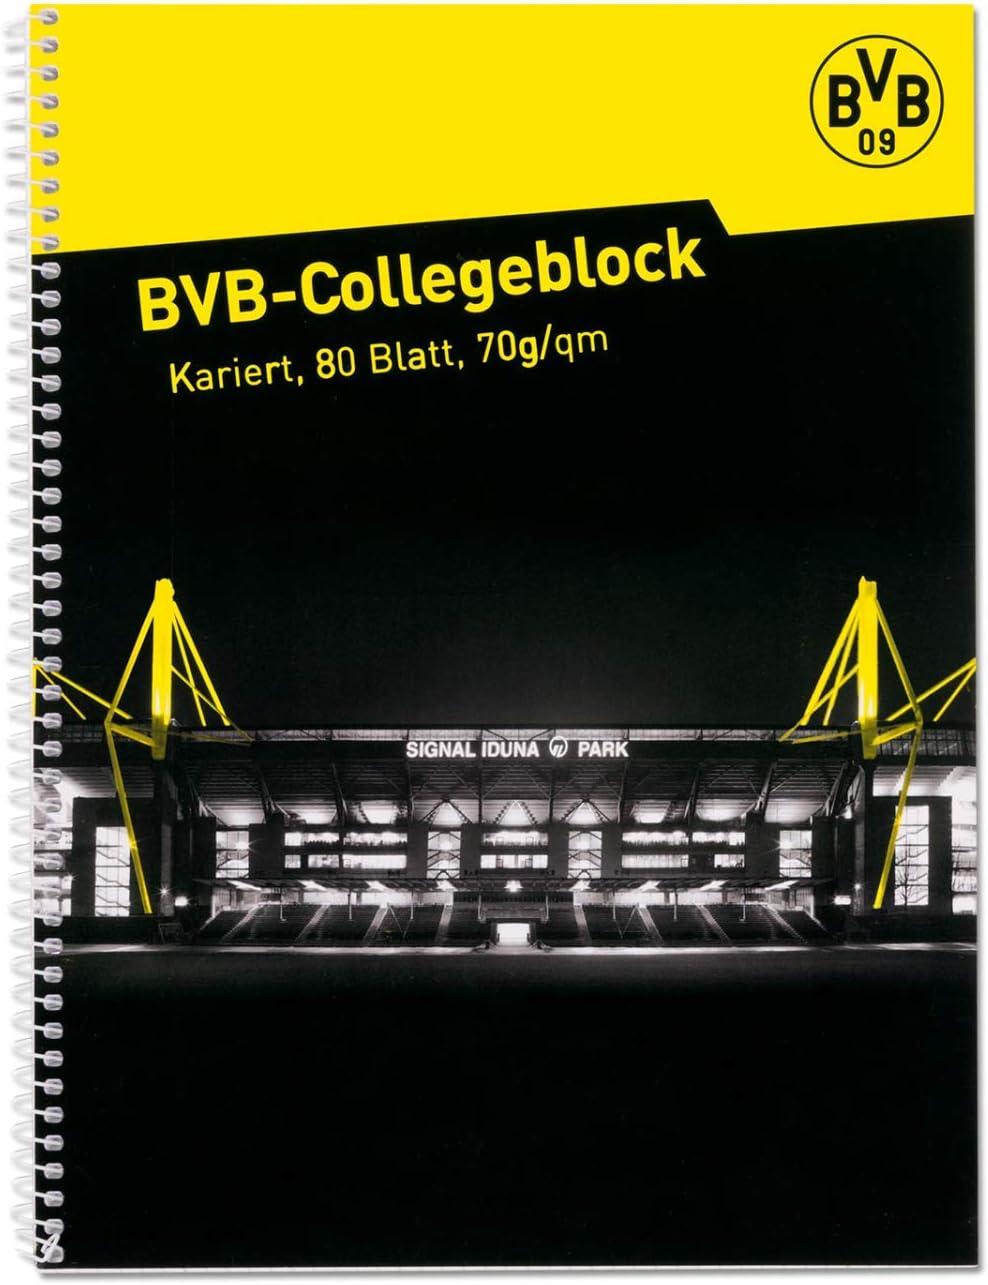 L Schreibblock Notizblock Ringbuch BVB 09 Borussia Dortmund Collegeblock Signal Iduna Park